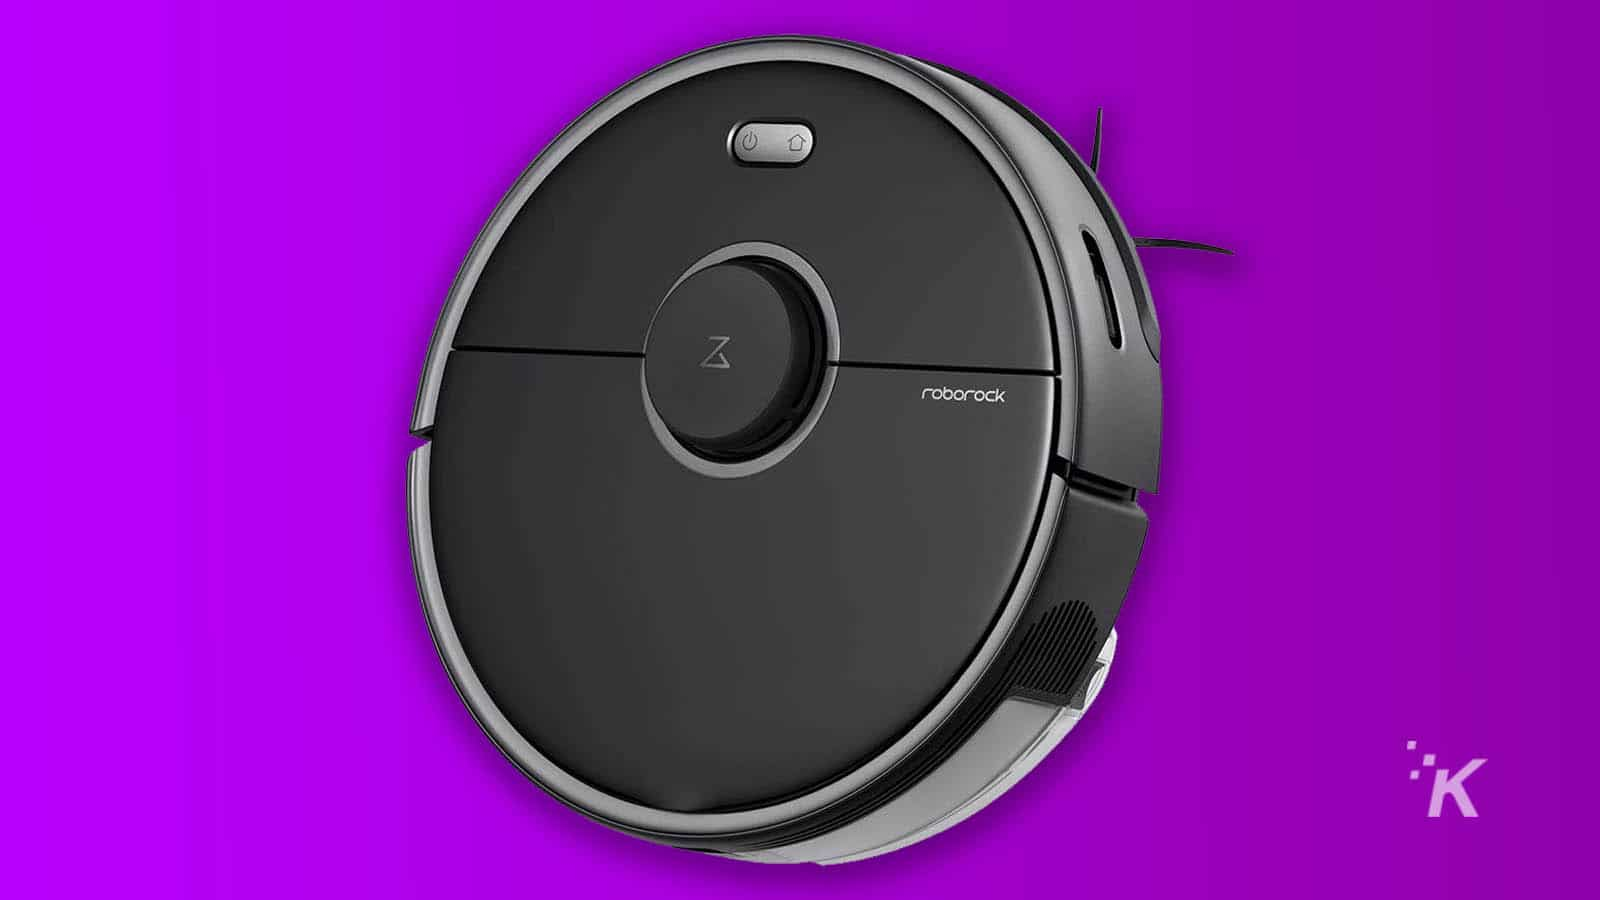 roborock s5 max on purple background